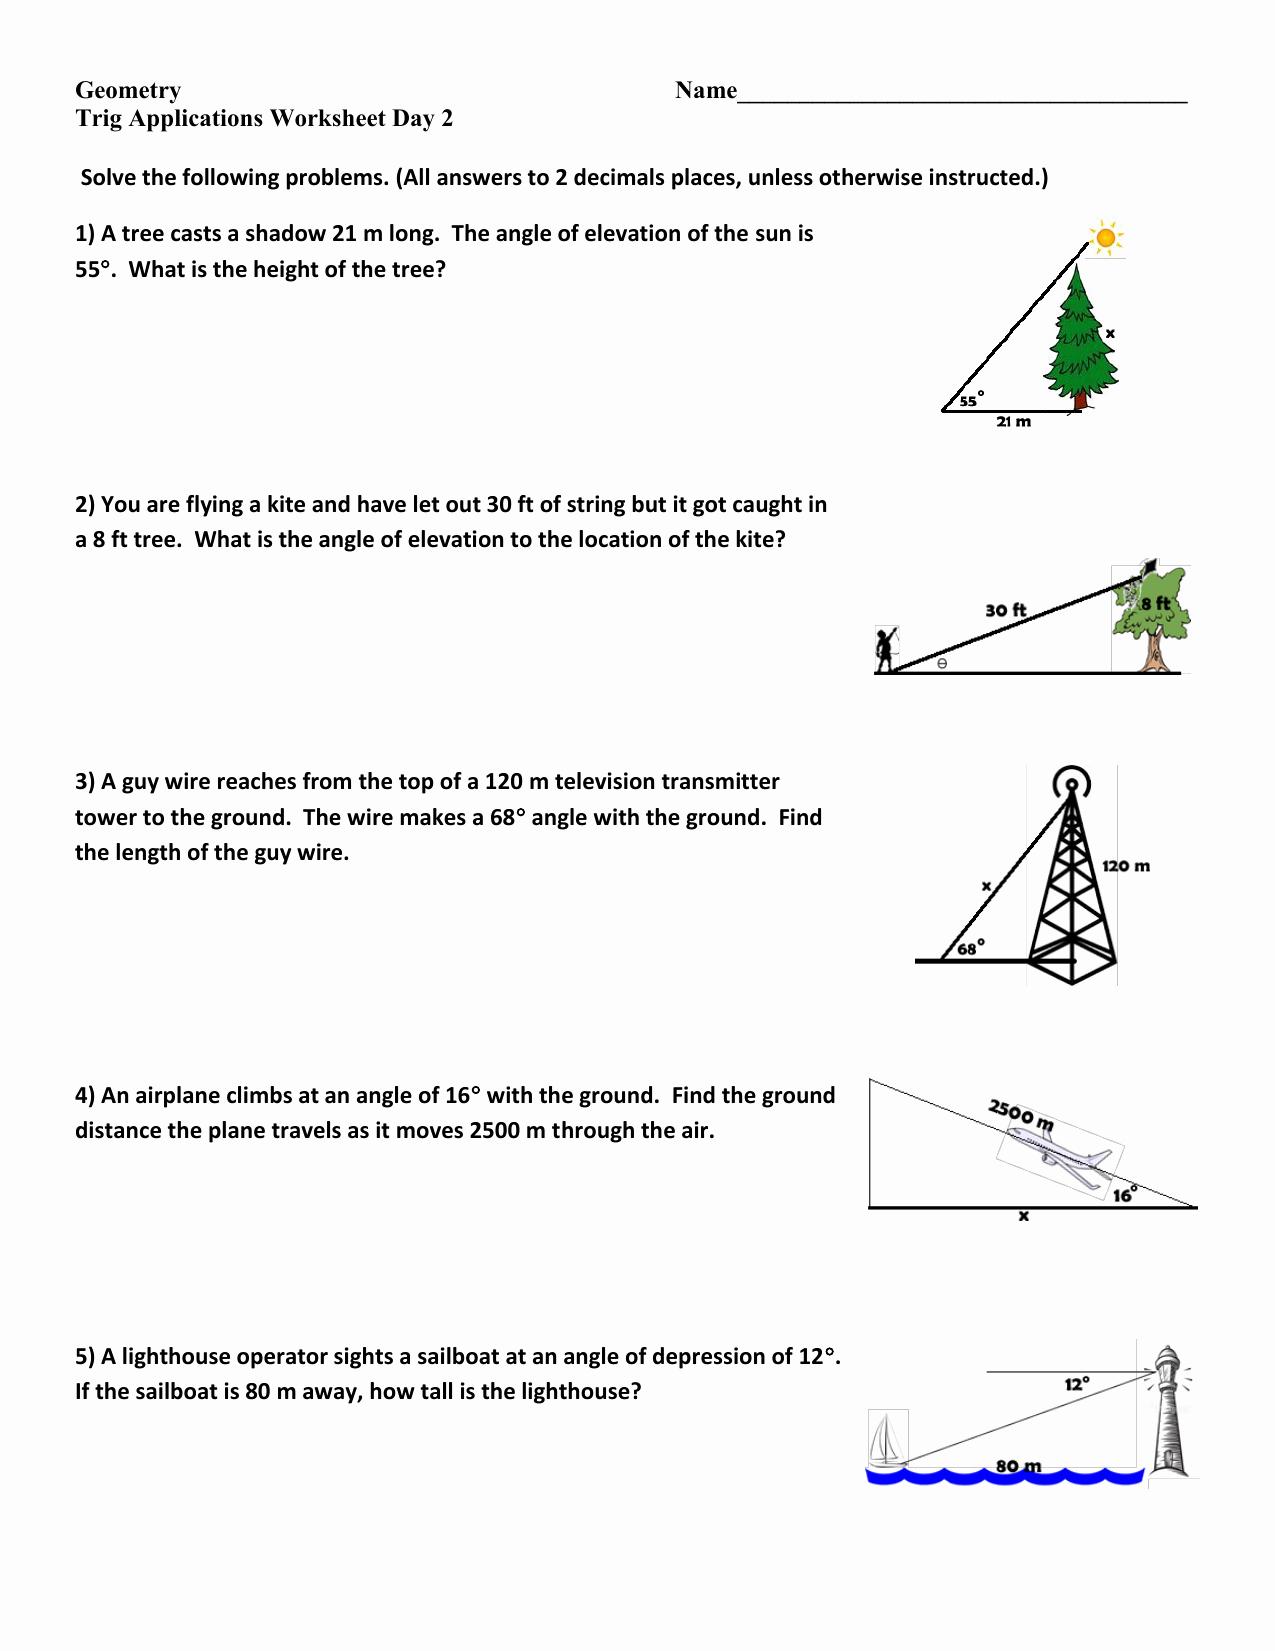 Right Triangle Trigonometry Worksheet Luxury Trigonometry Word Problems Worksheets with Answers